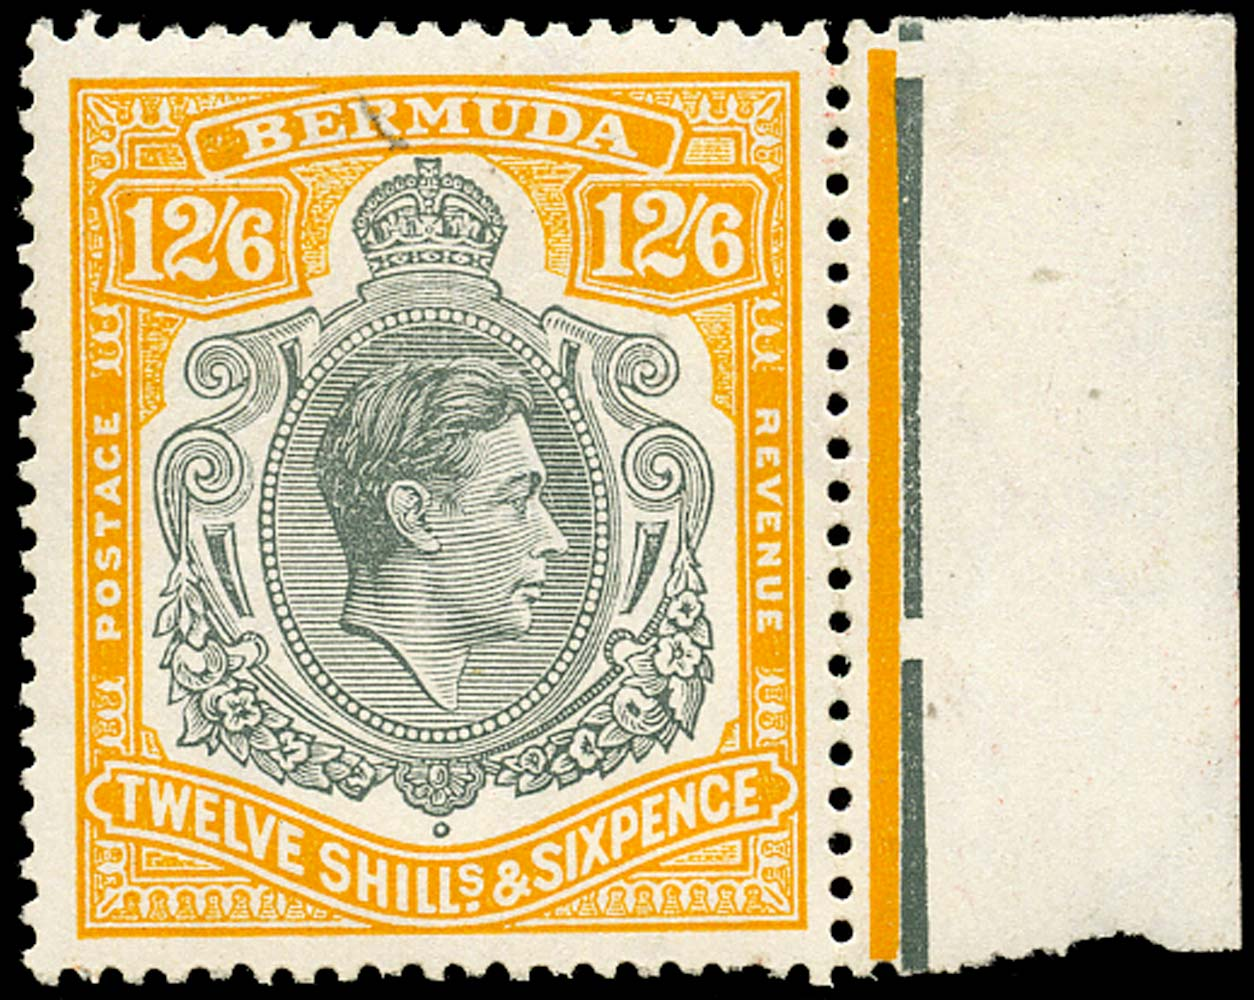 BERMUDA 1950  SG120e Mint 12s6d grey and pale orange perf 13 HPF 48